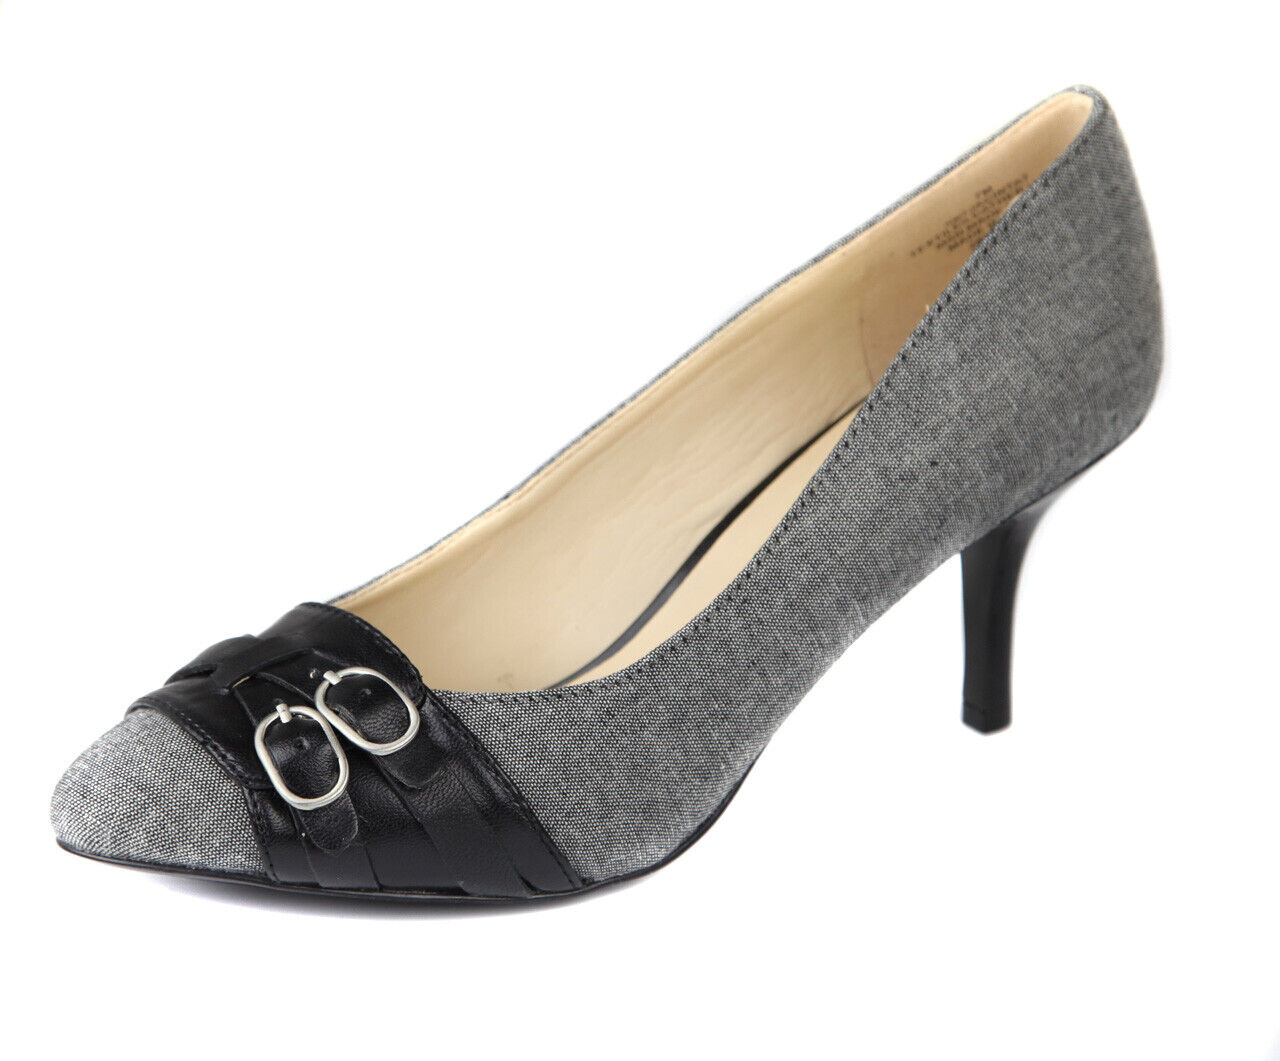 Nine West Damen Grau Schwarz Jacinta High Heels Pumps Schuhe Ret. Neu